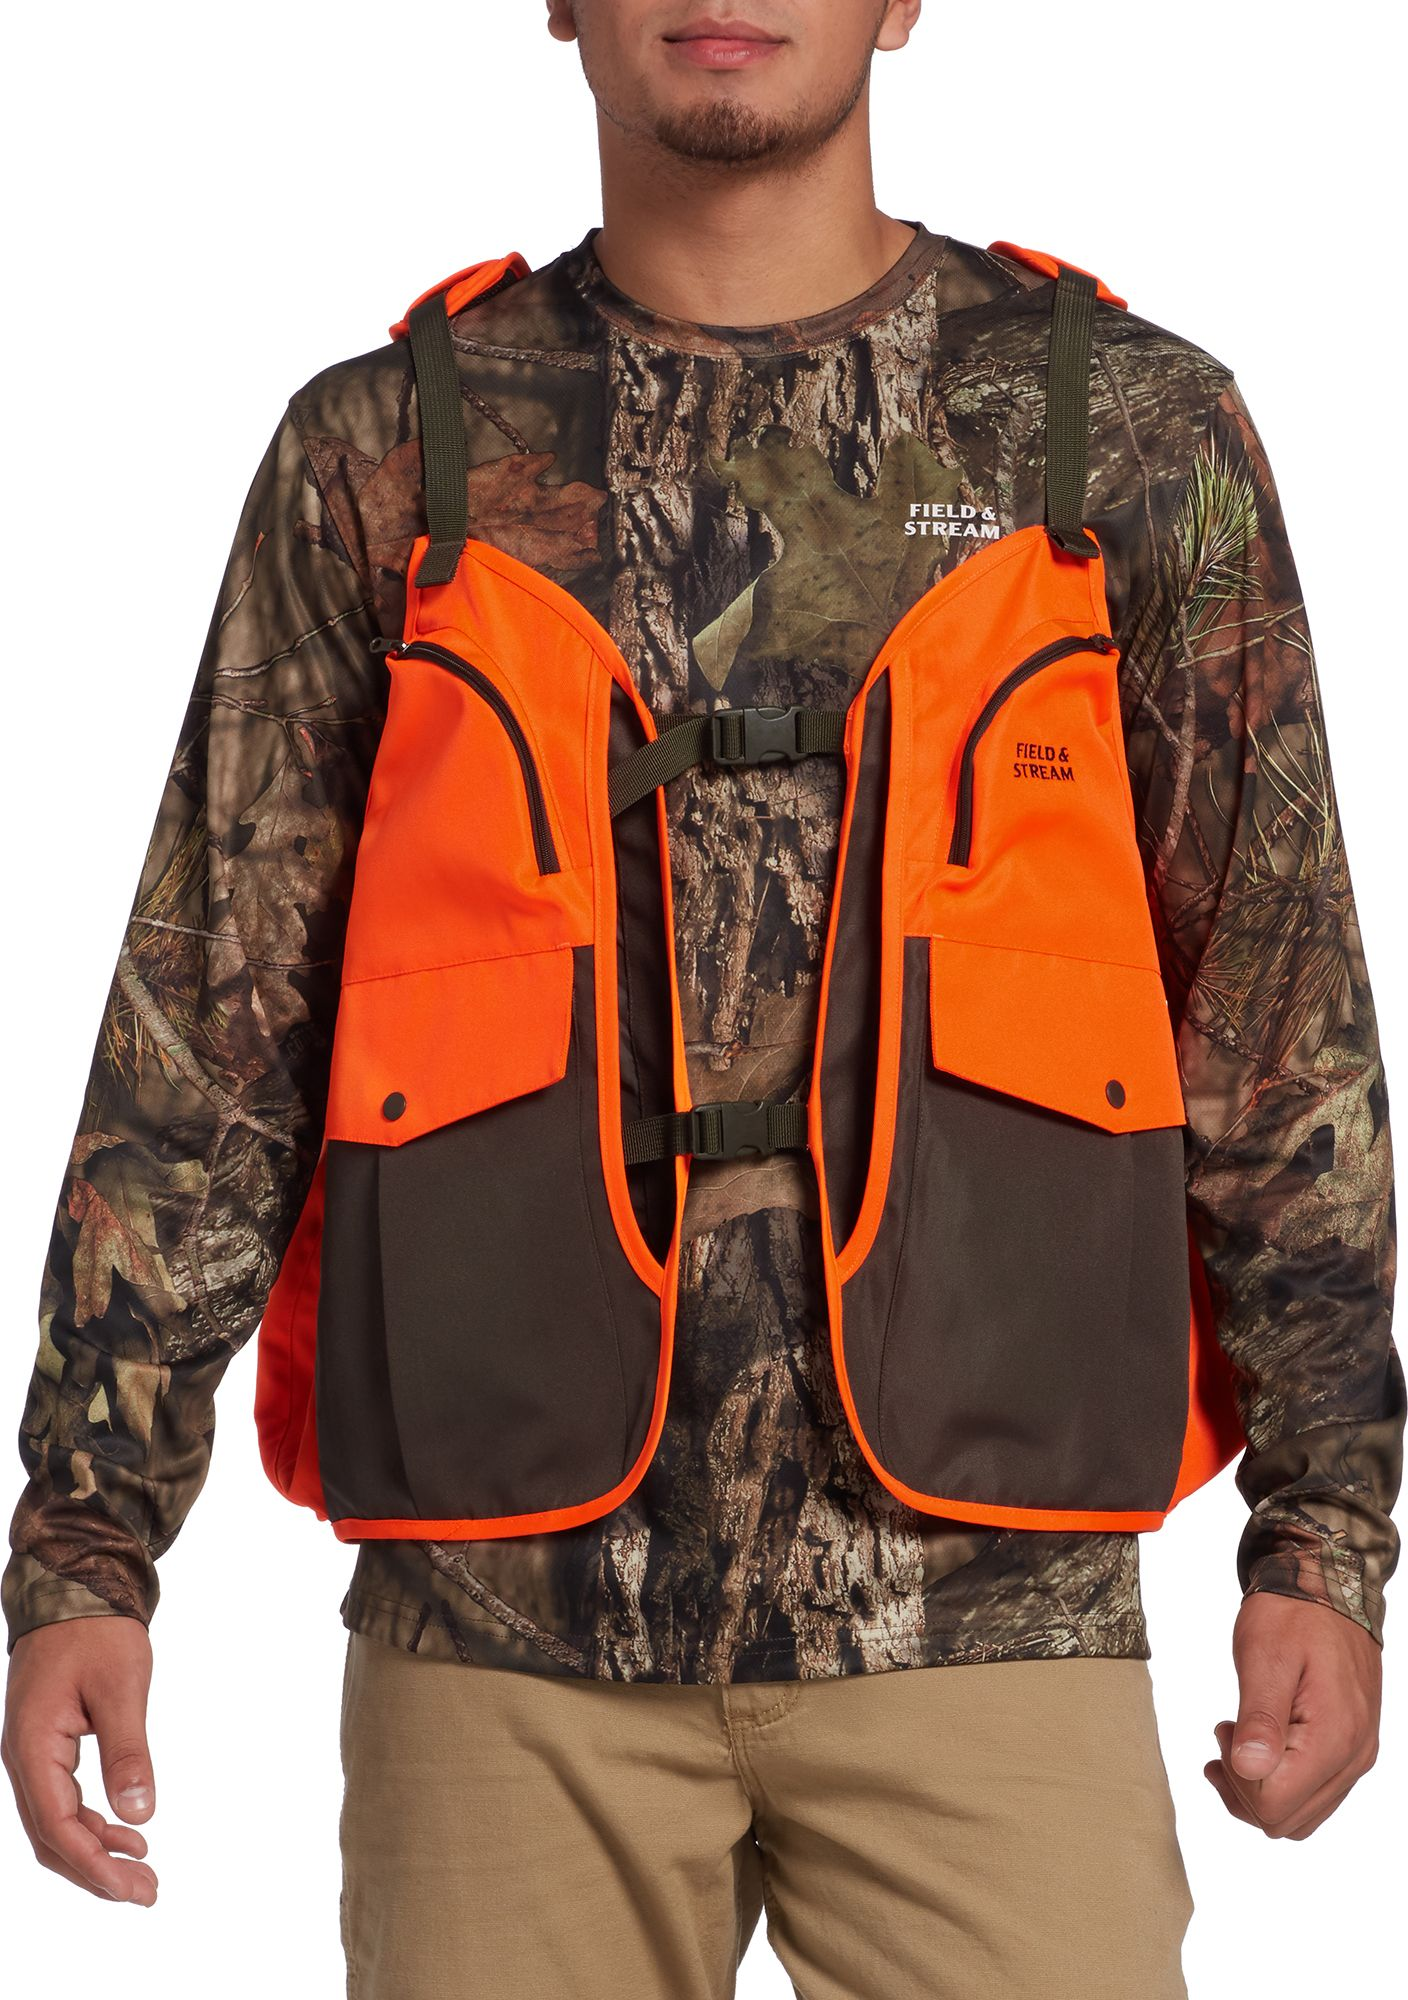 Field & Stream Men's Elevated Upland Vest, Size: Medium/Large, Blaze Orange